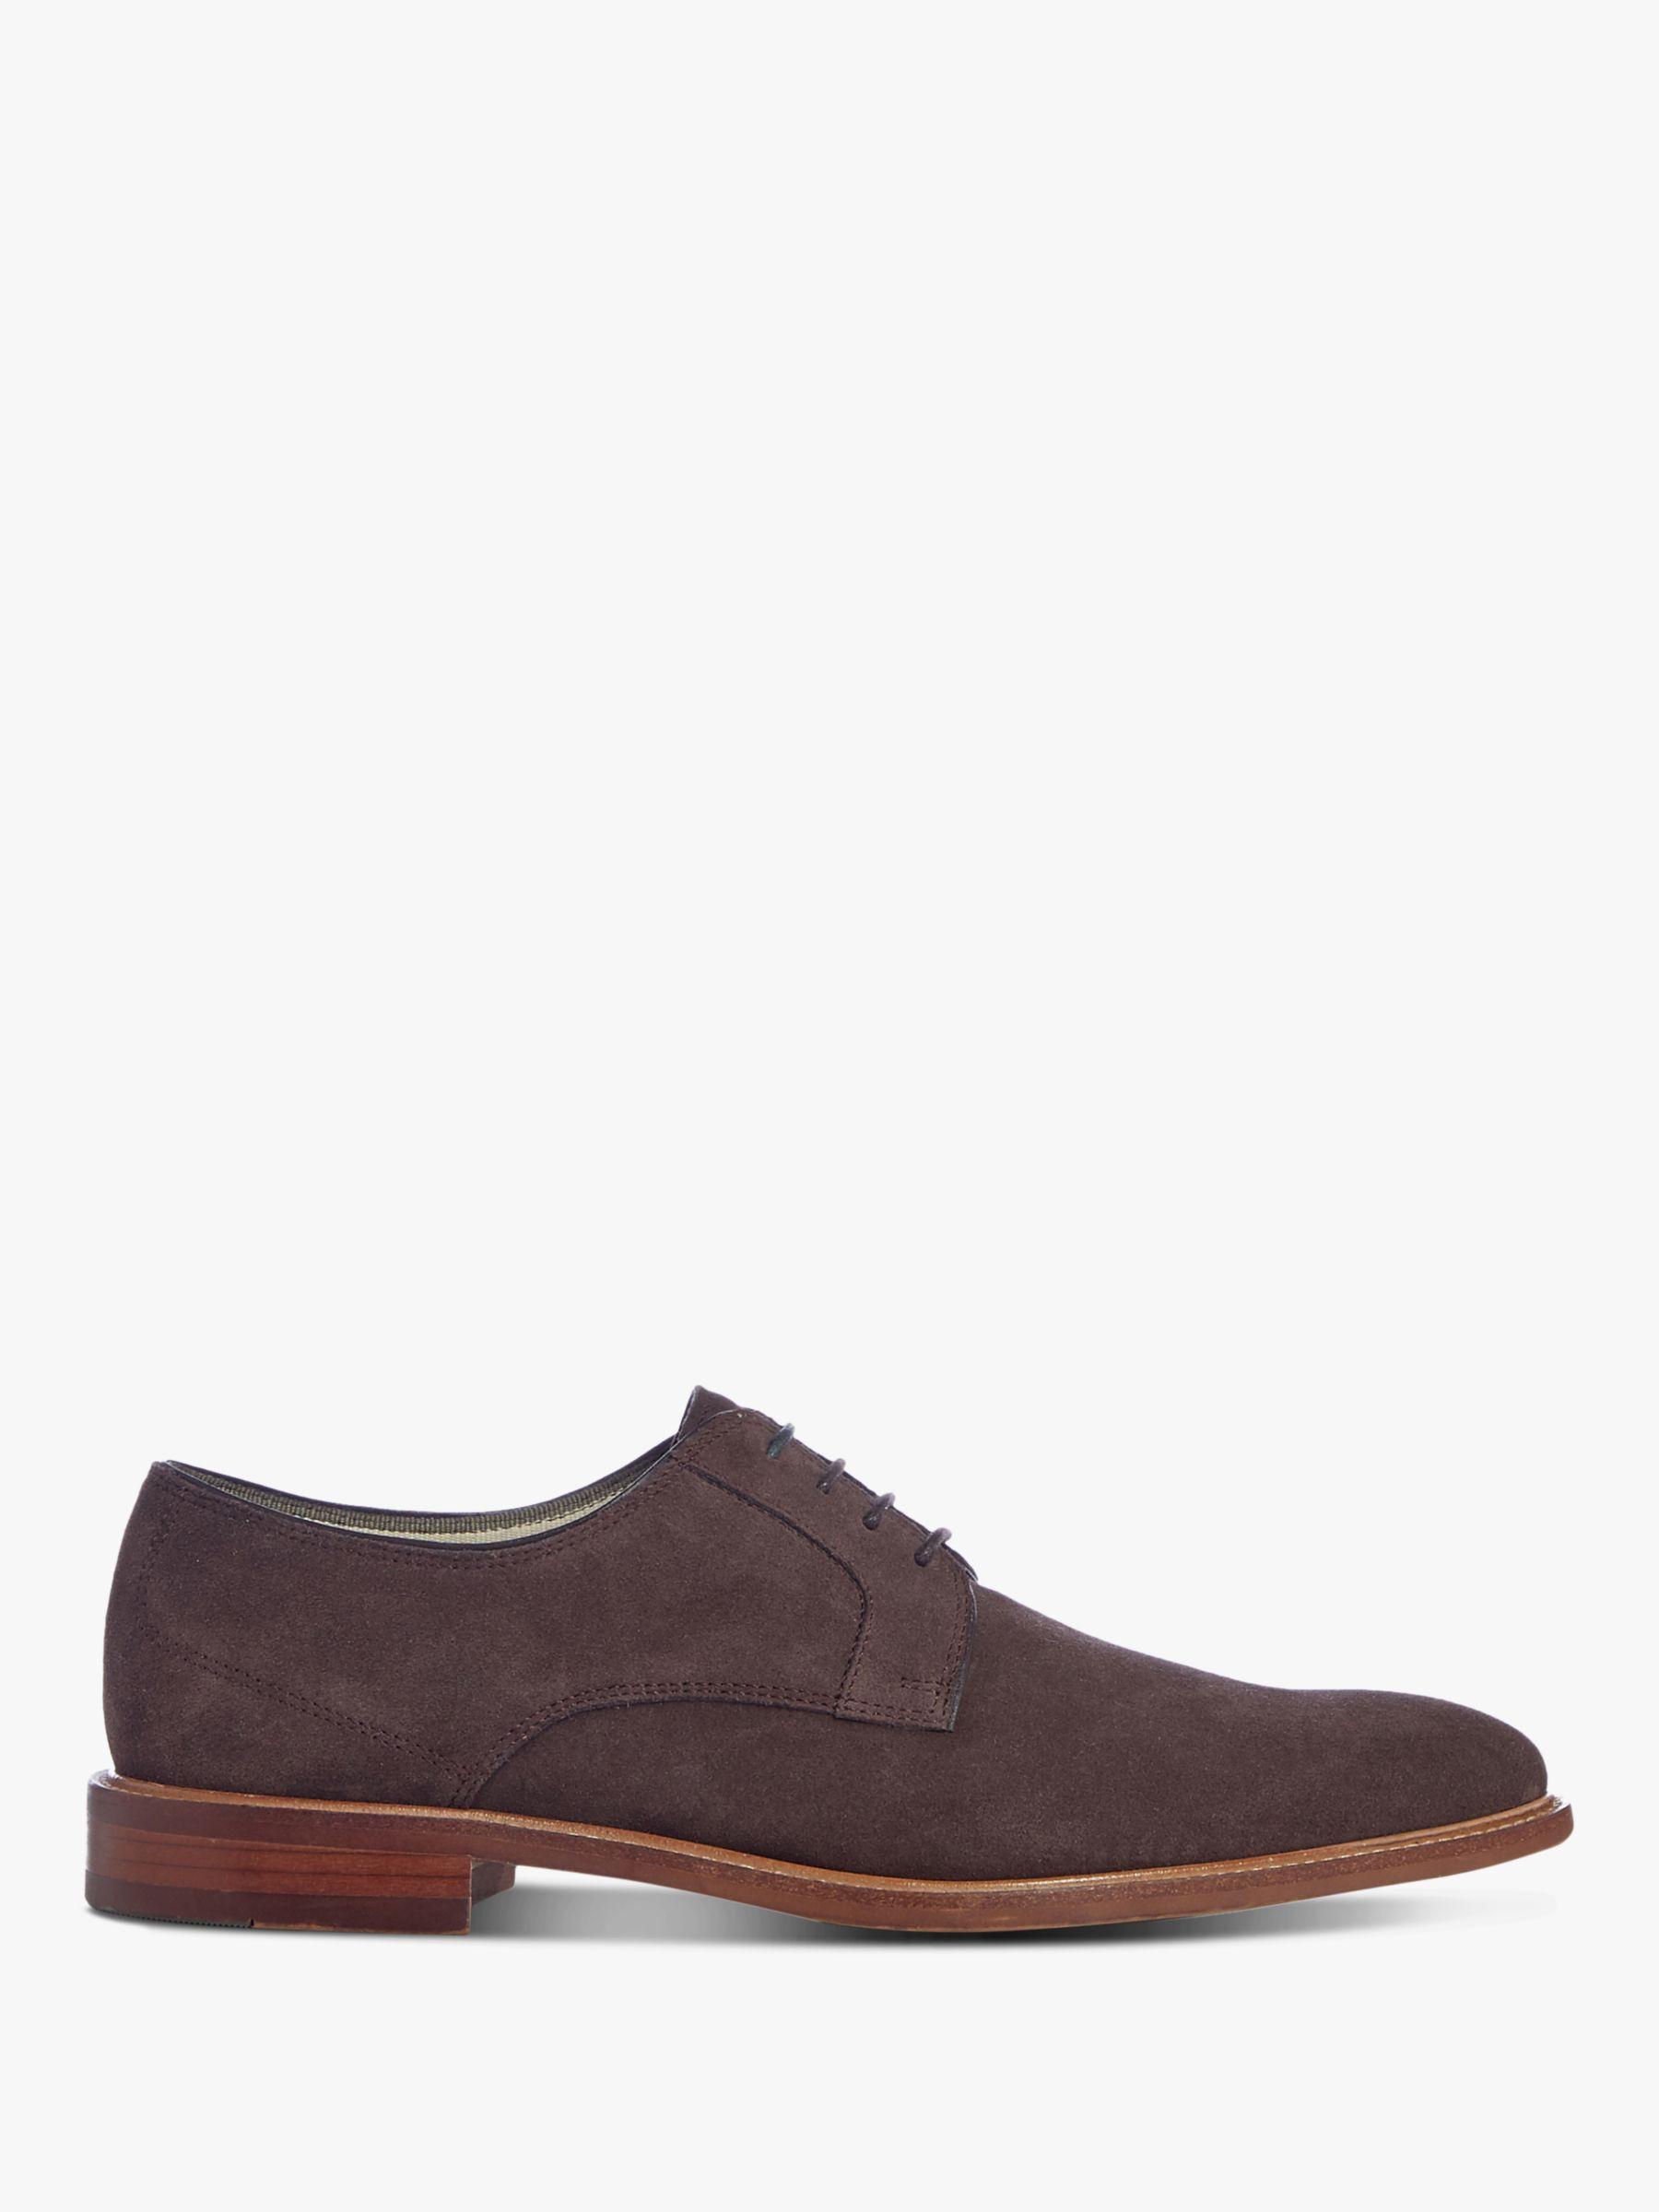 Dune Dune Bretons Suede Derby Shoes, Dark Brown Suede